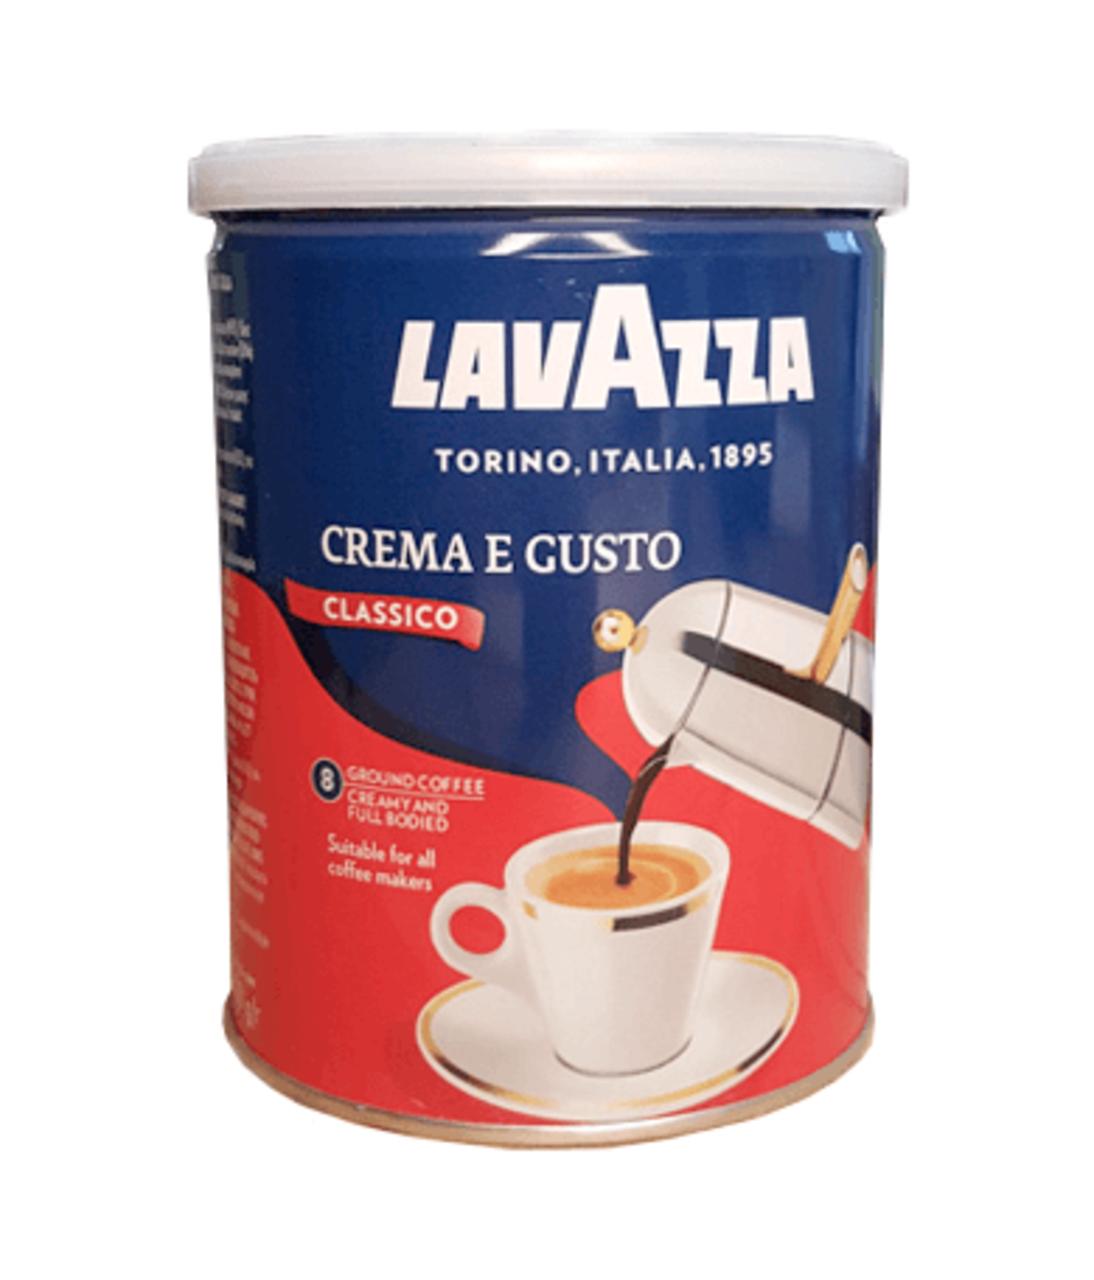 Кофе Lavazza Crema E Gusto Classico. superflowers.com.ua. Купить молотый кофе Lavazza Crema E Gusto